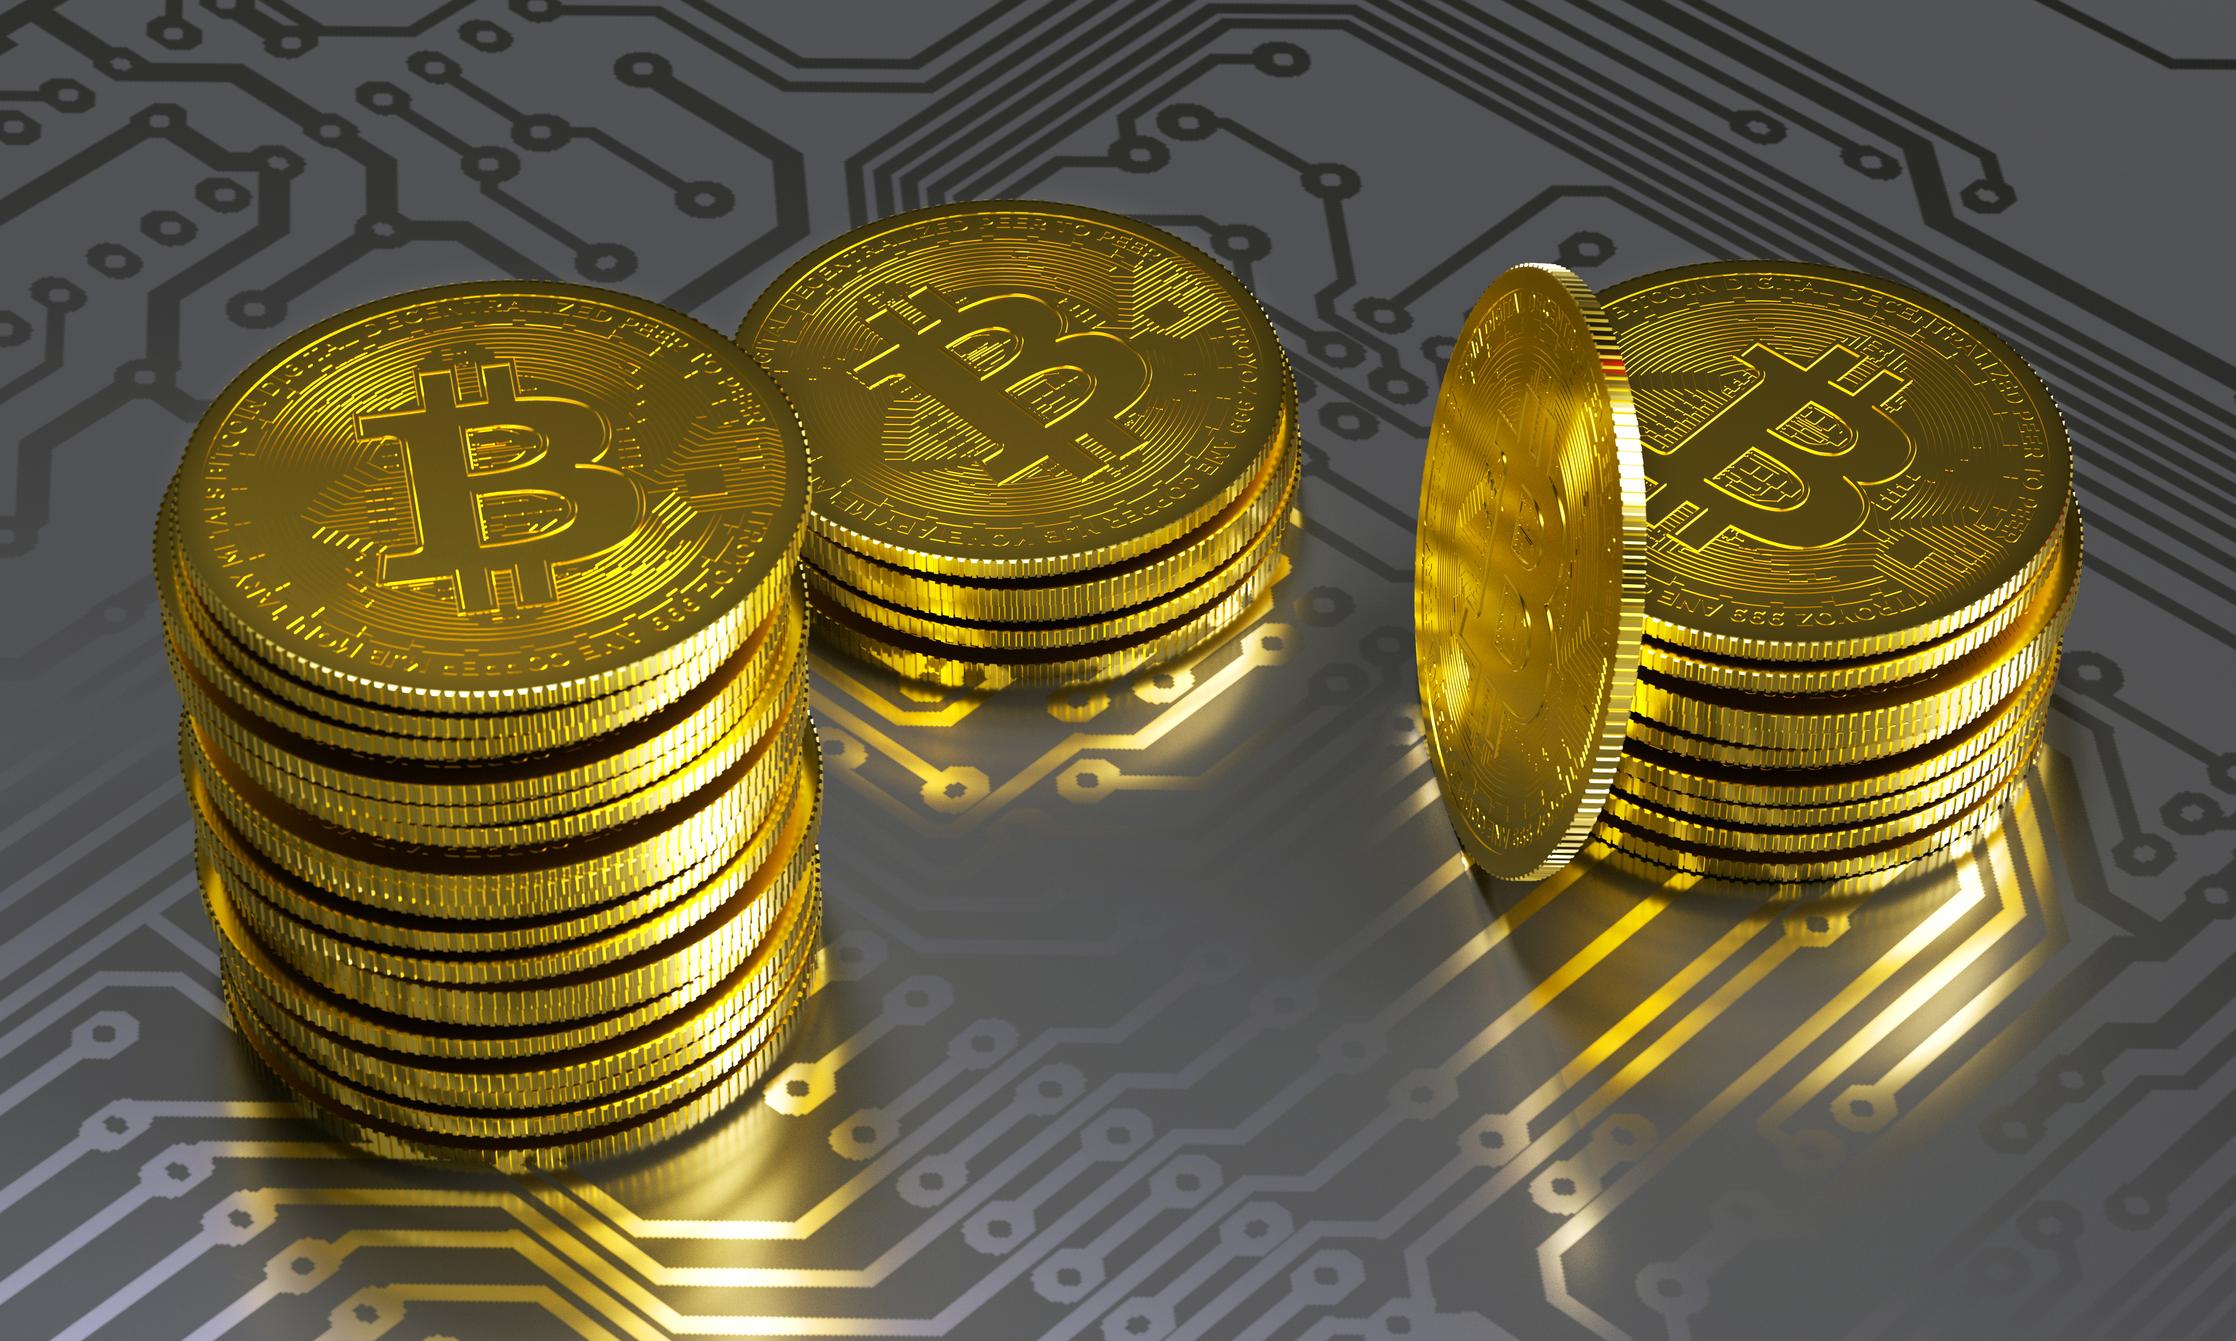 Better Fintech Stock: Coinbase vs. Square